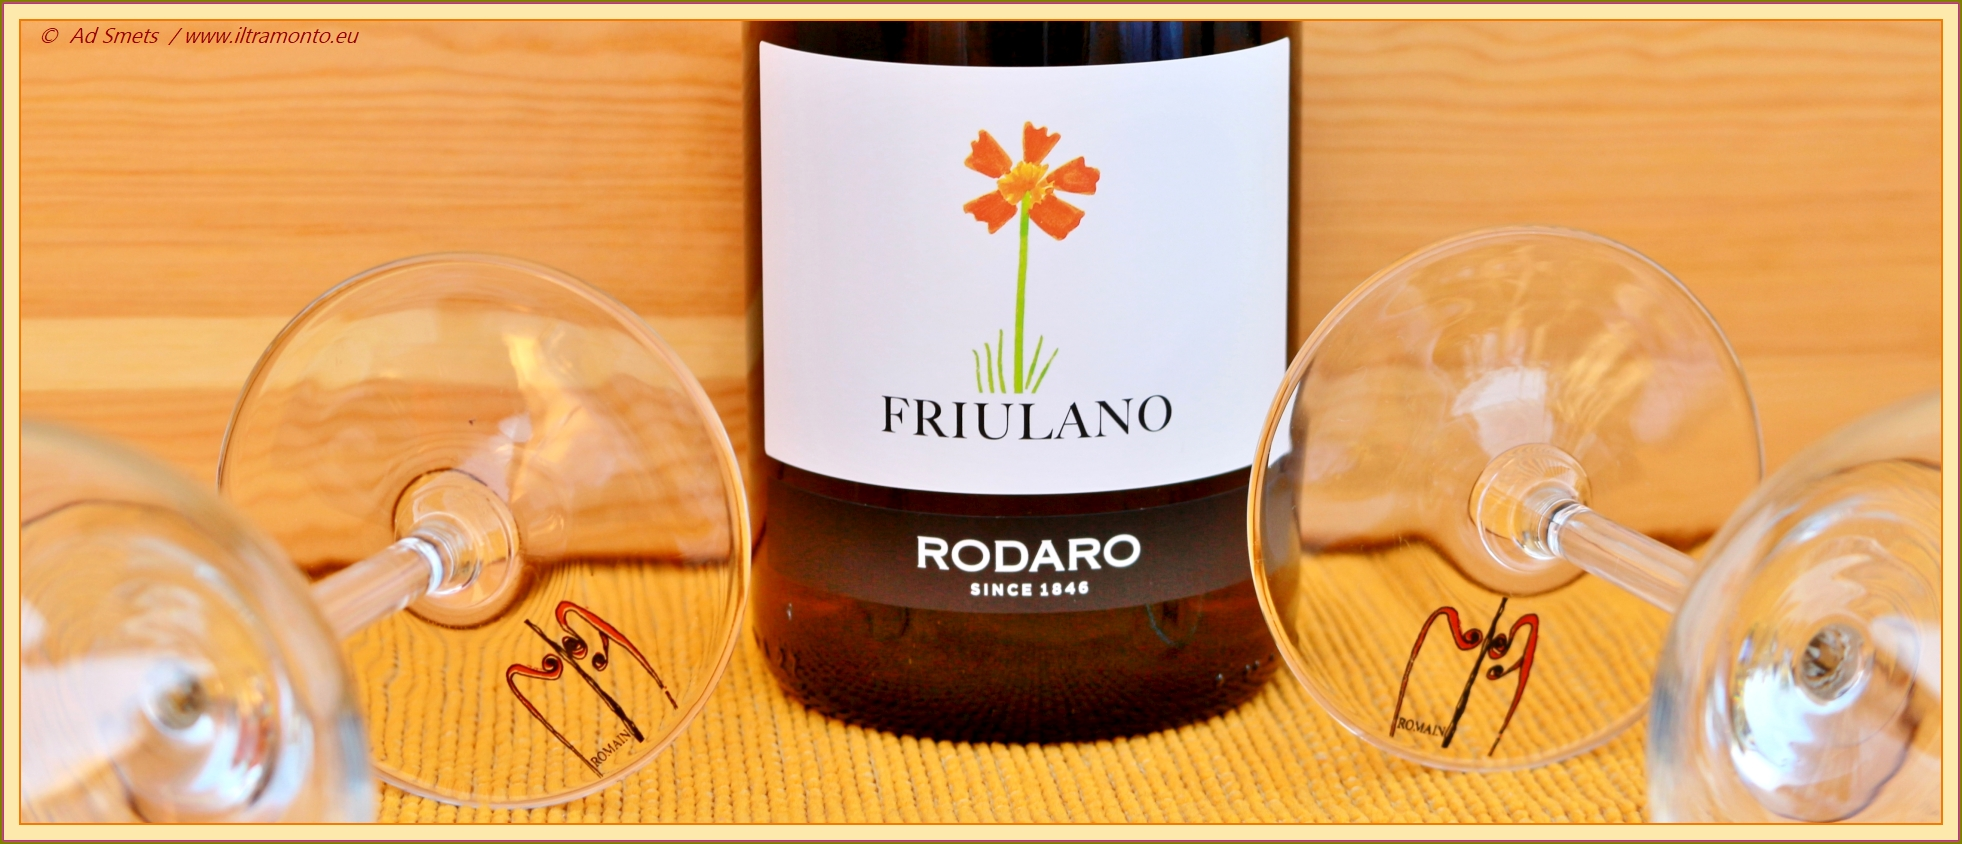 friulano-rodaro_0935_il-tramonto-wines